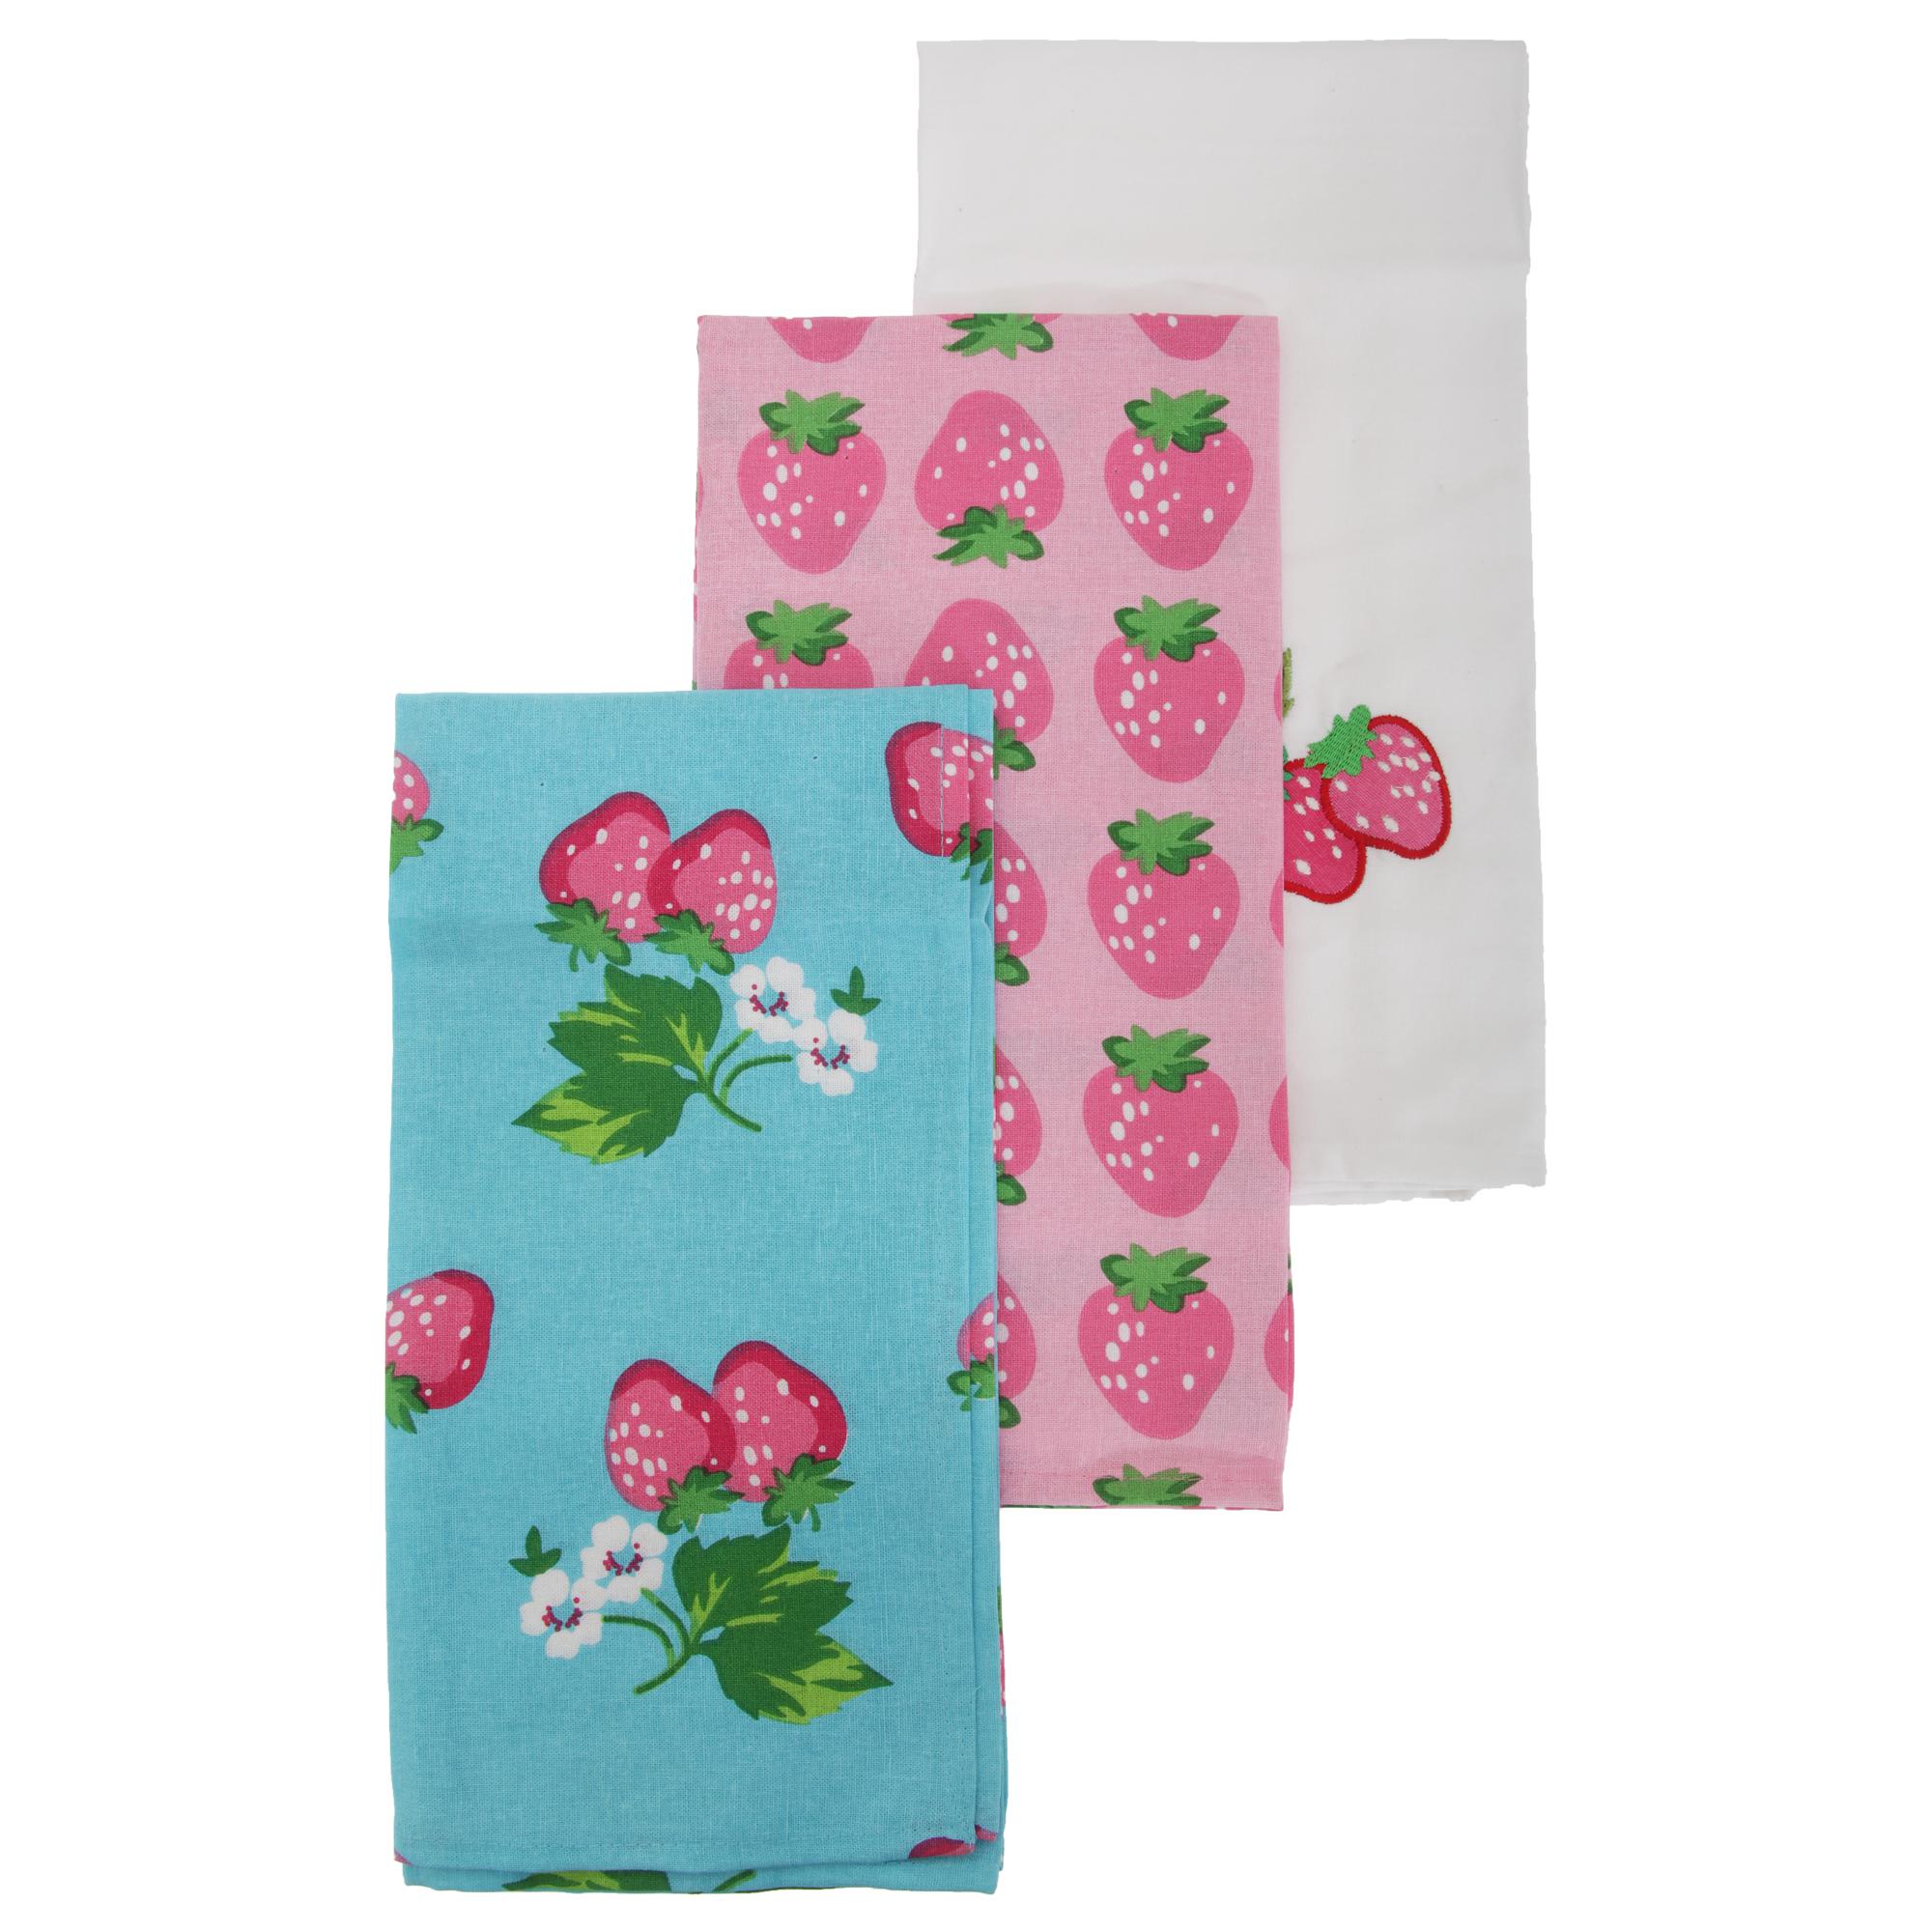 Quality Tea Towels Uk: Strawberry Pattern Extra Large Tea Towel/Dish Towel Set